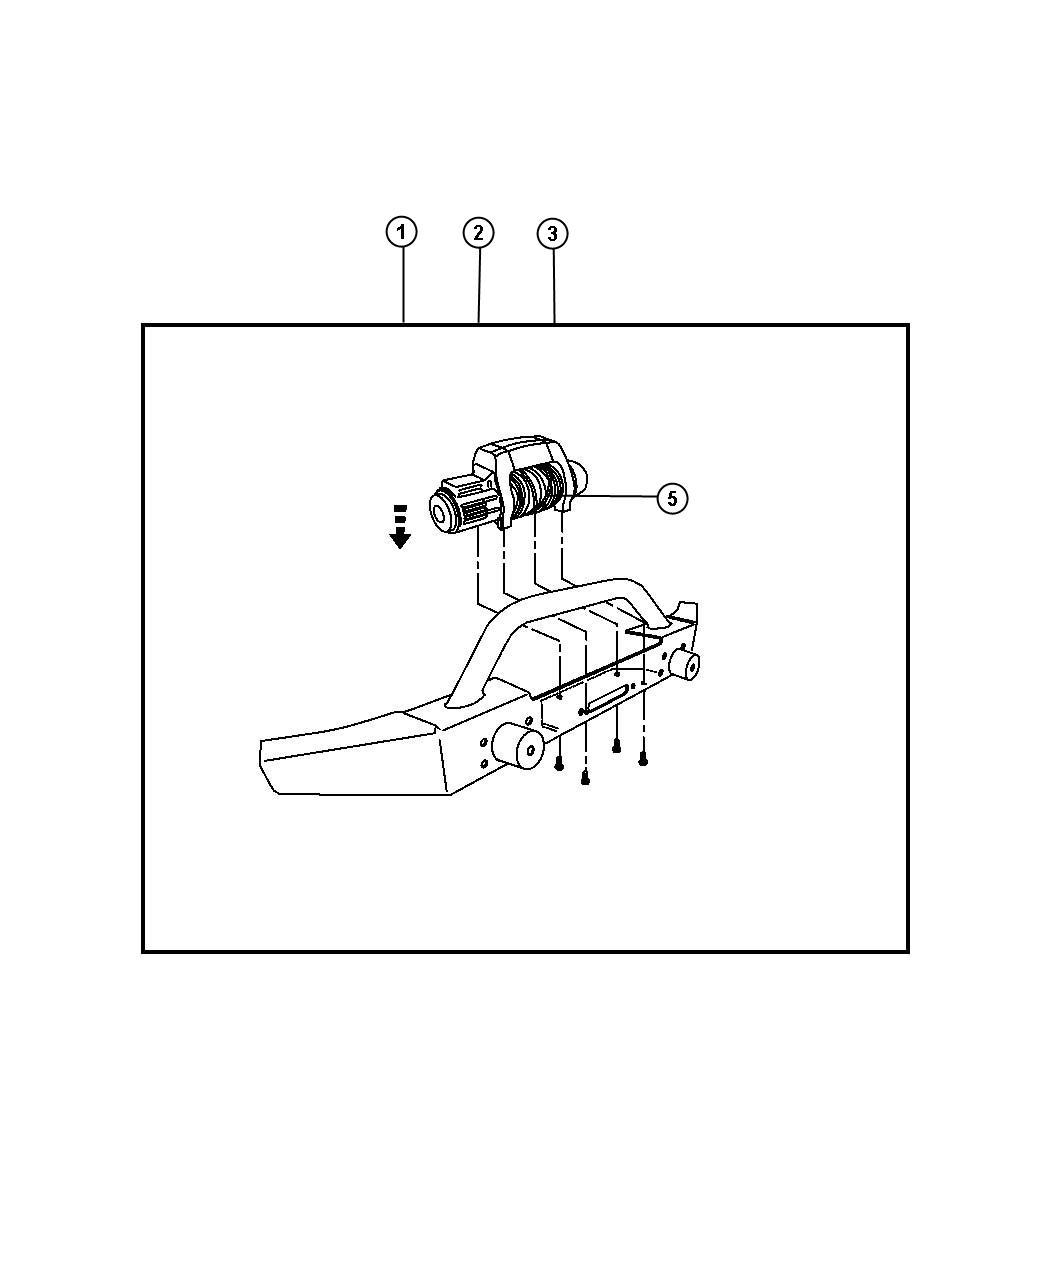 Jeep Wrangler Remote Control Winch Kit Model